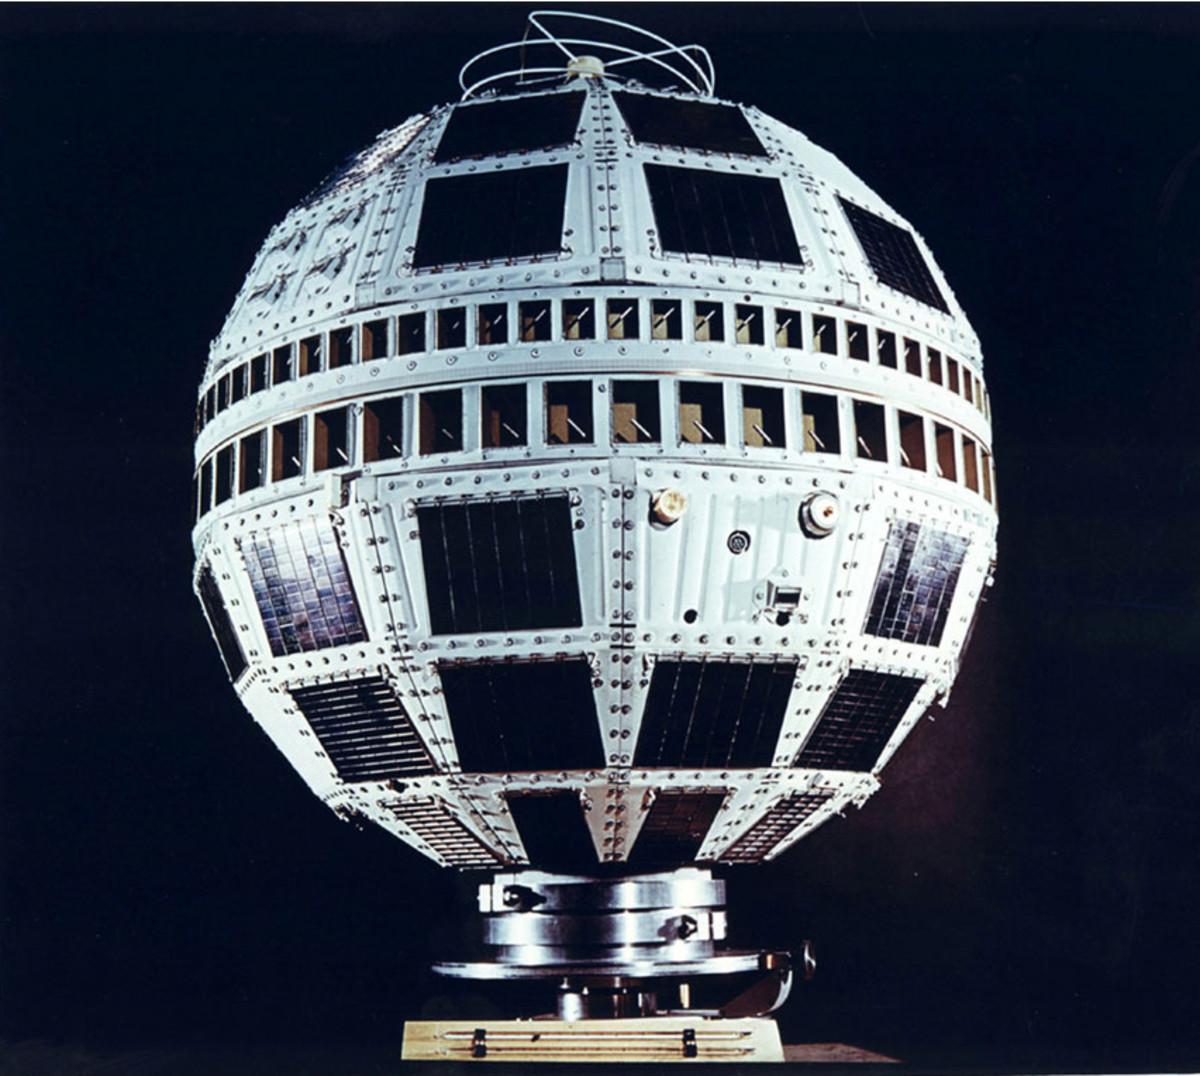 Closeup of the Telstar satellite